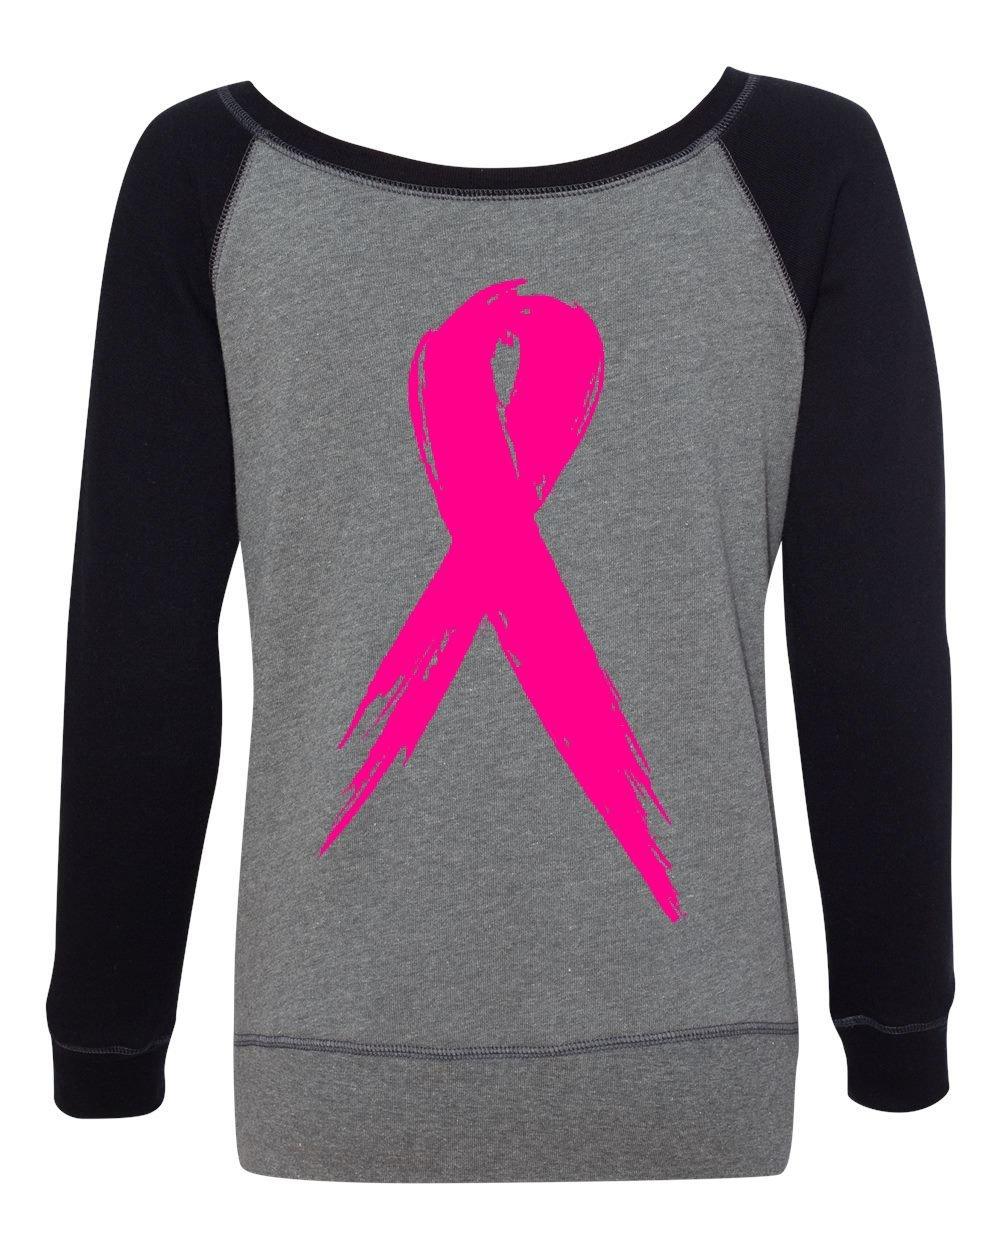 Tee Hunt Pink Ribbon Breast Cancer Awareness Women's Sweatshirt Hope Fight Survivor Black/Gray 2XL